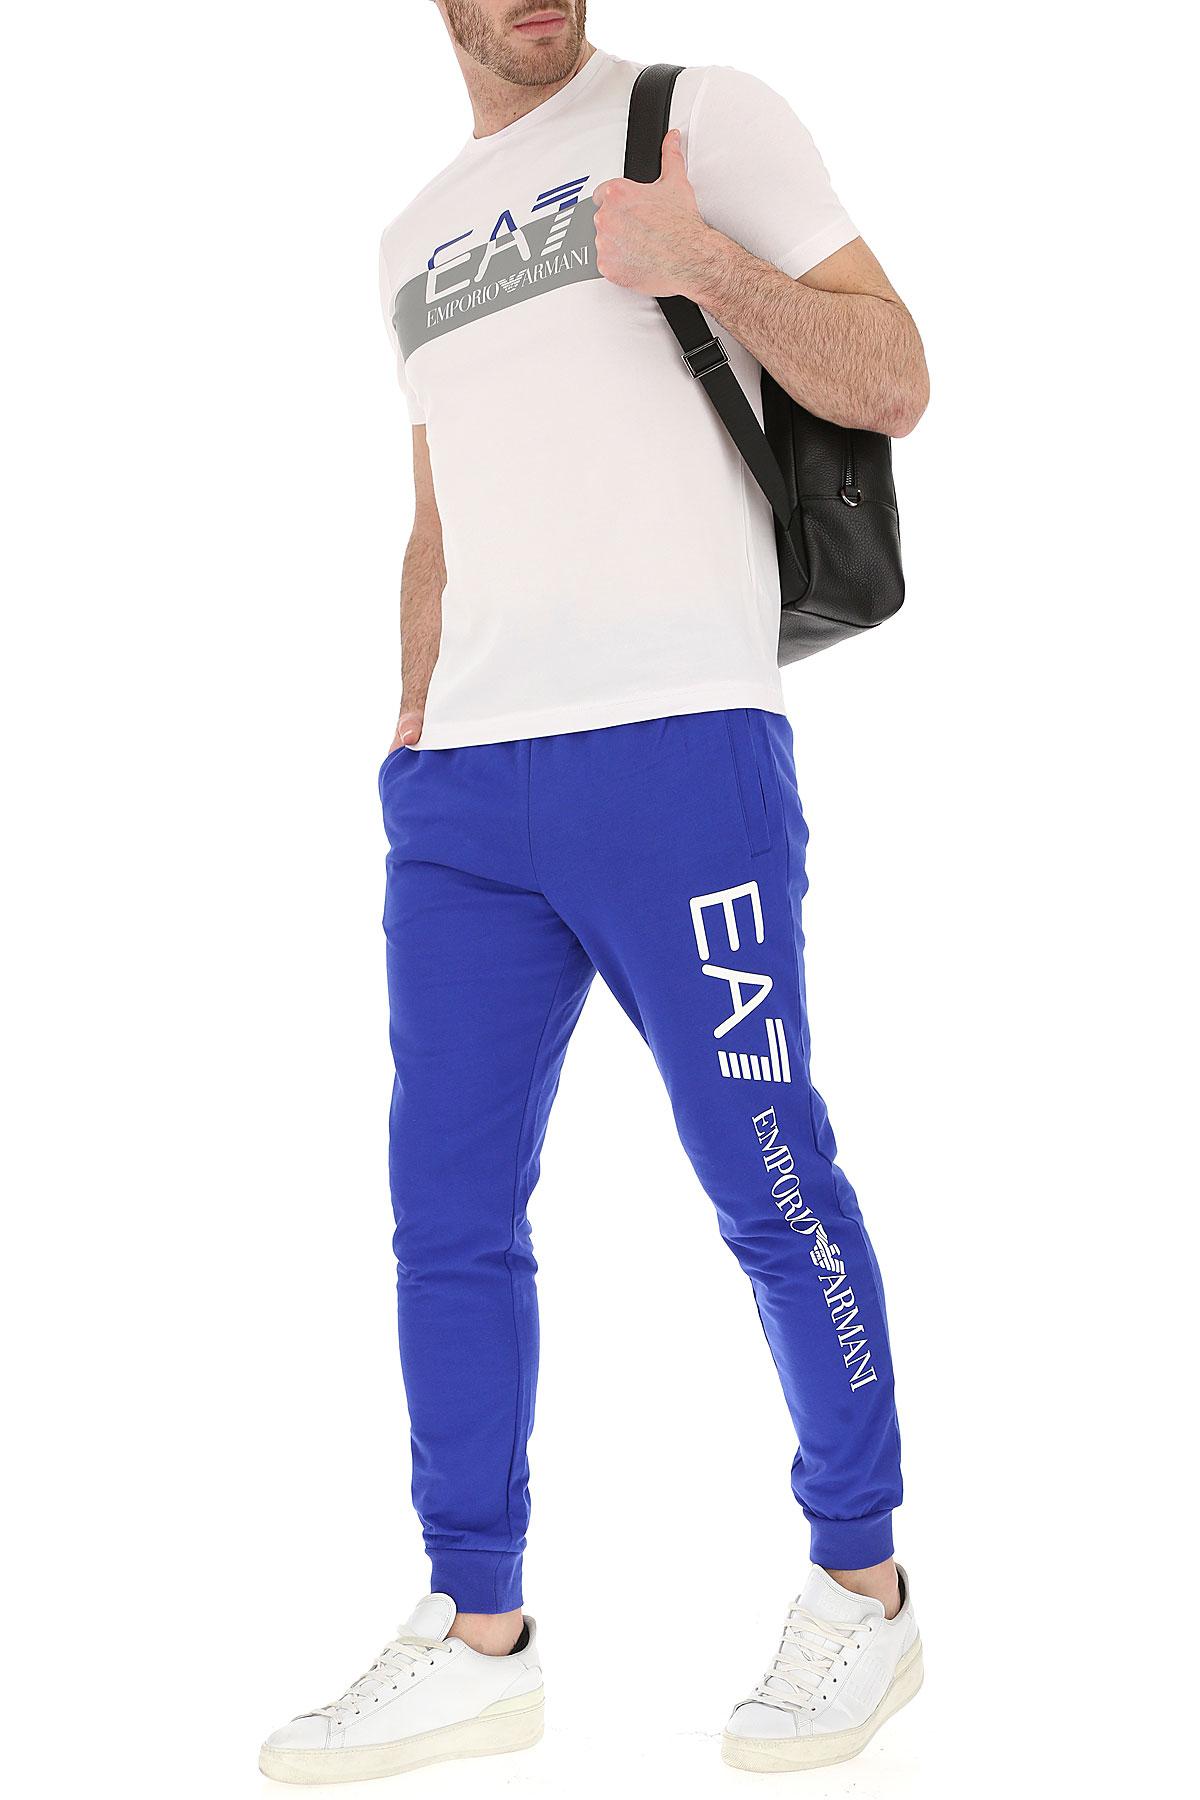 Armani Hombres Primavera Ropa Cobalto verano 2019 Azul Blanco Emporio Para gdqnxBq